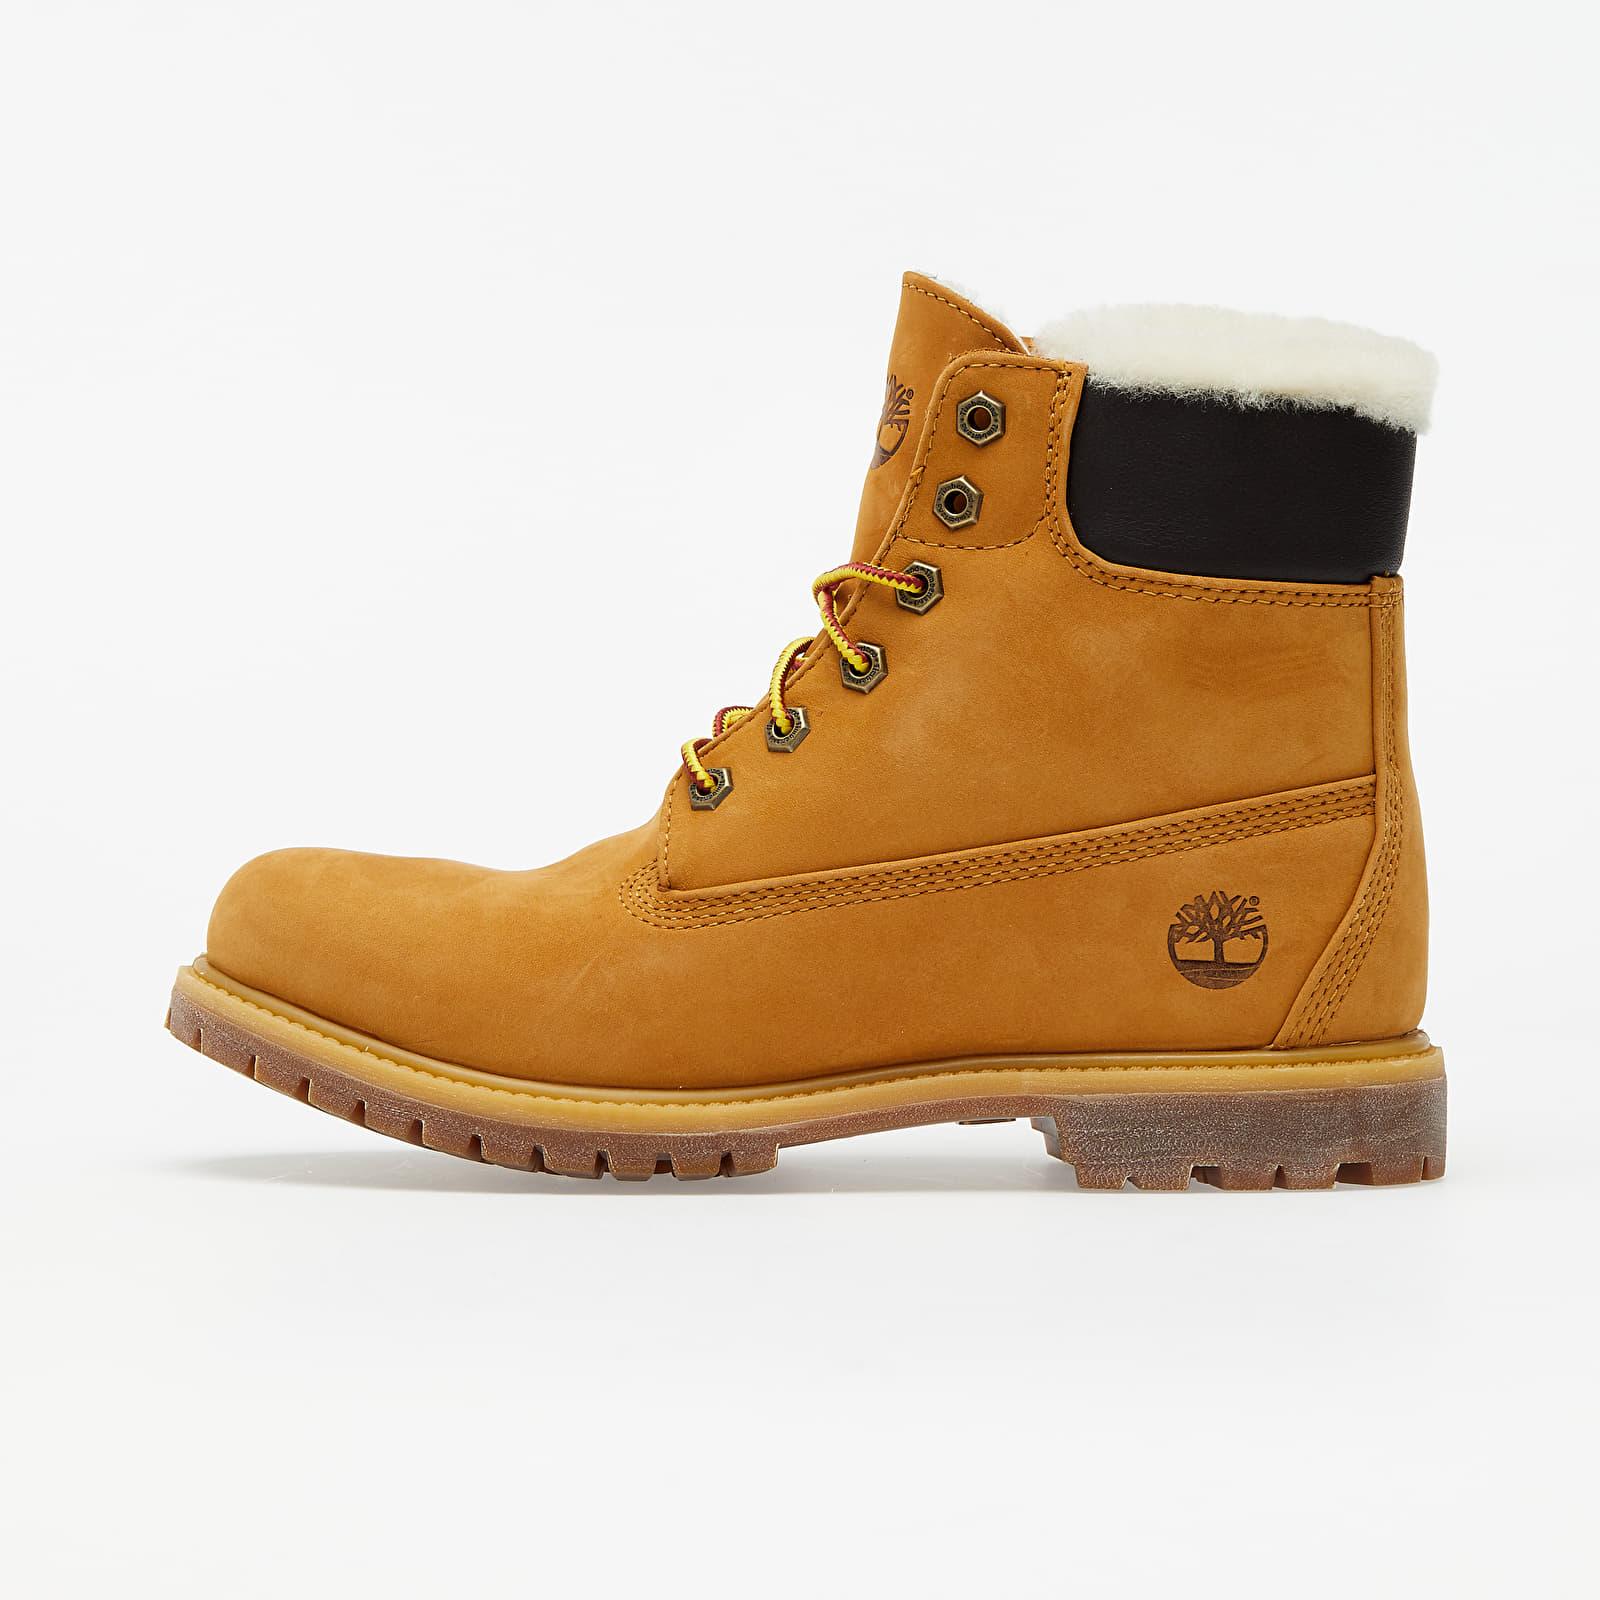 Chaussures et baskets femme Timberland 6 In Prem Shrl Wp Wheat